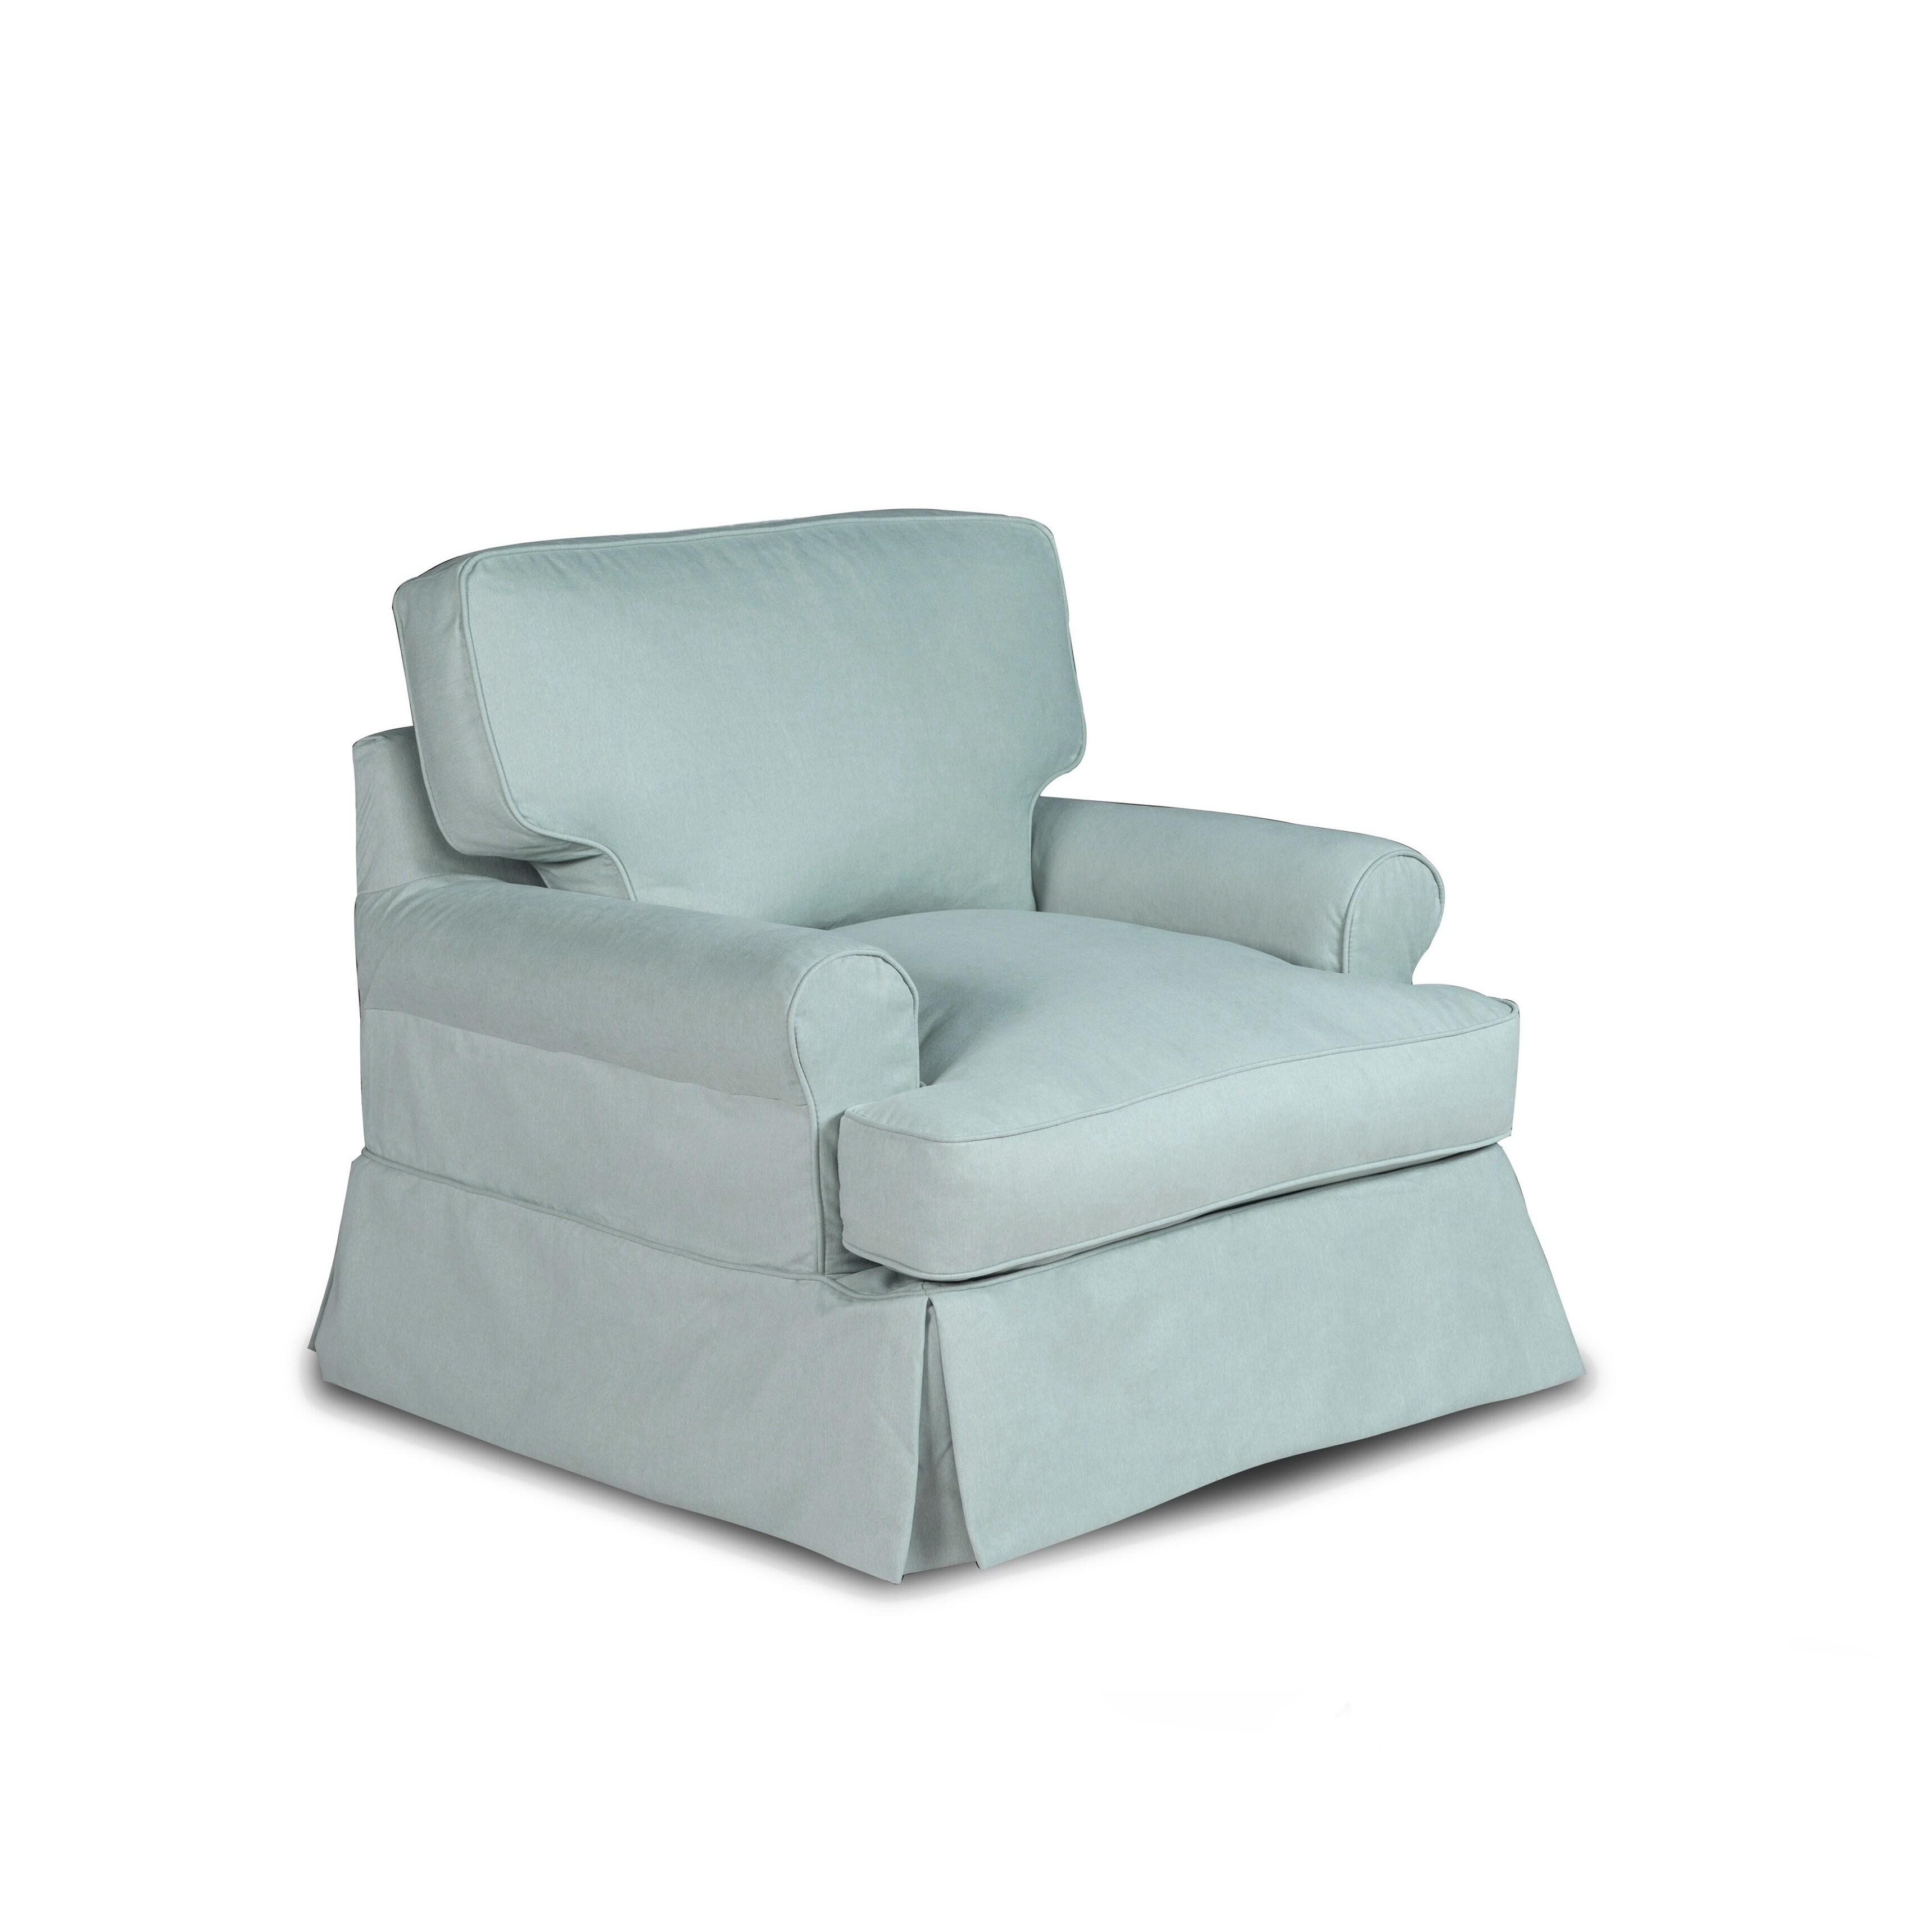 Sunset Trading Horizon T Cushion Chair Slipcover Performance Fabric Ocean Blue